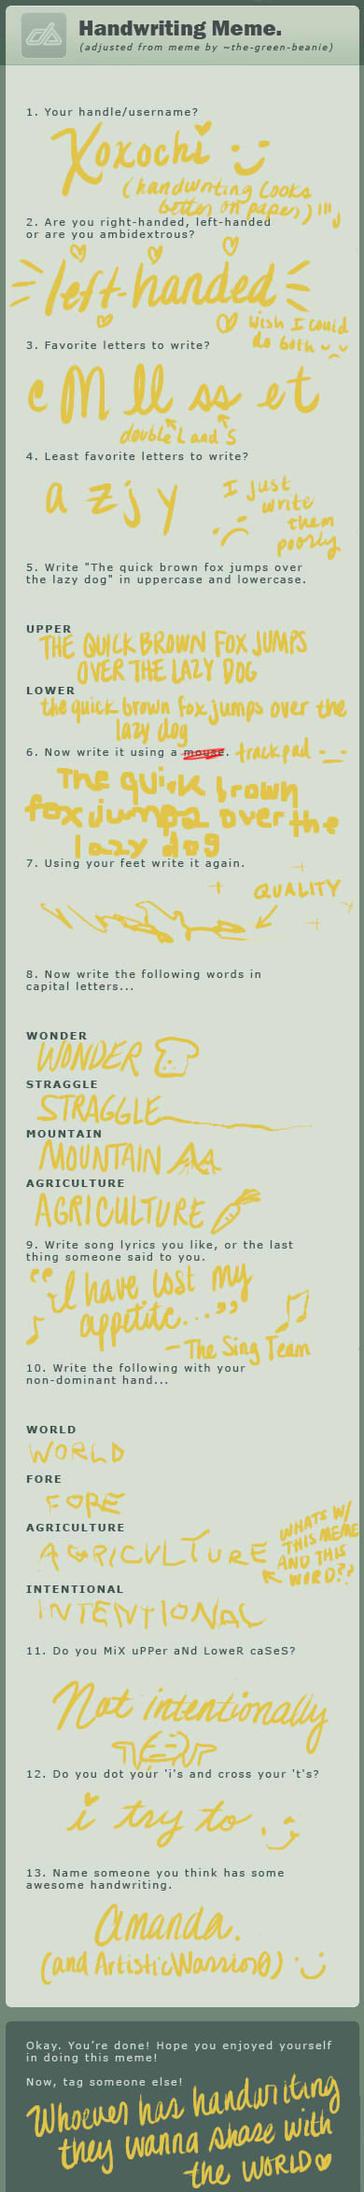 Handwriting Meme by Xoxochi